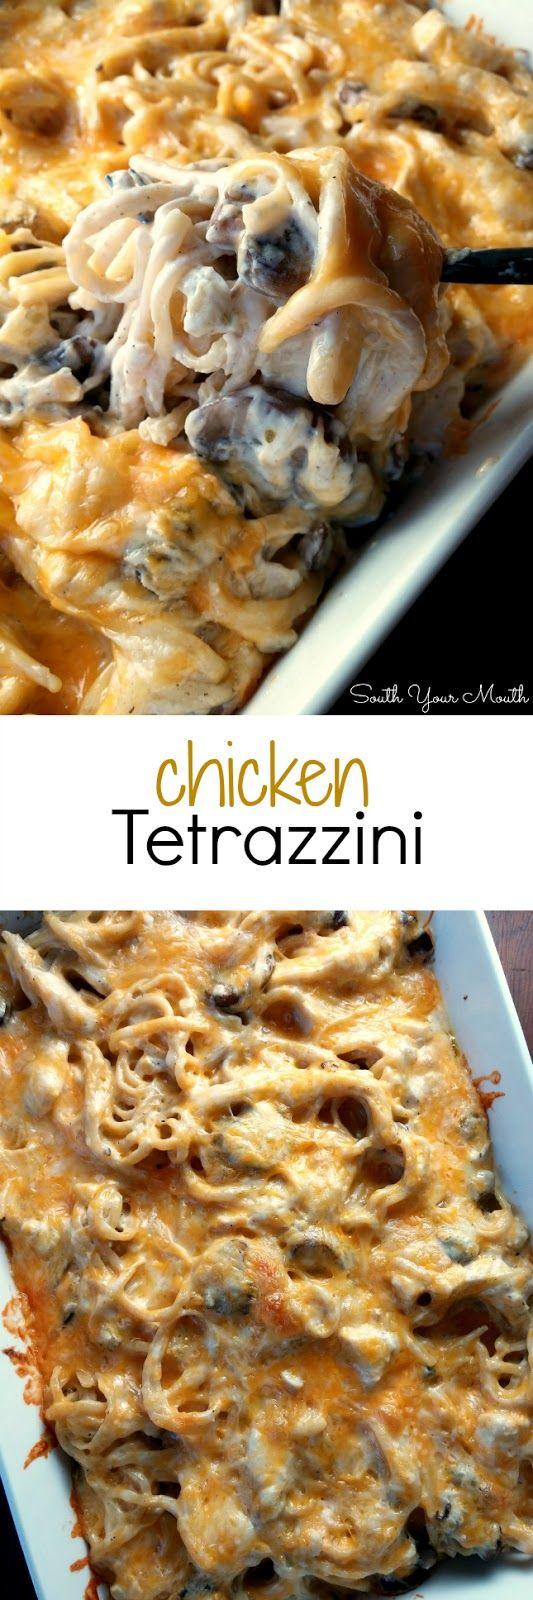 Chicken Tetrazzini with mushrooms and white wine